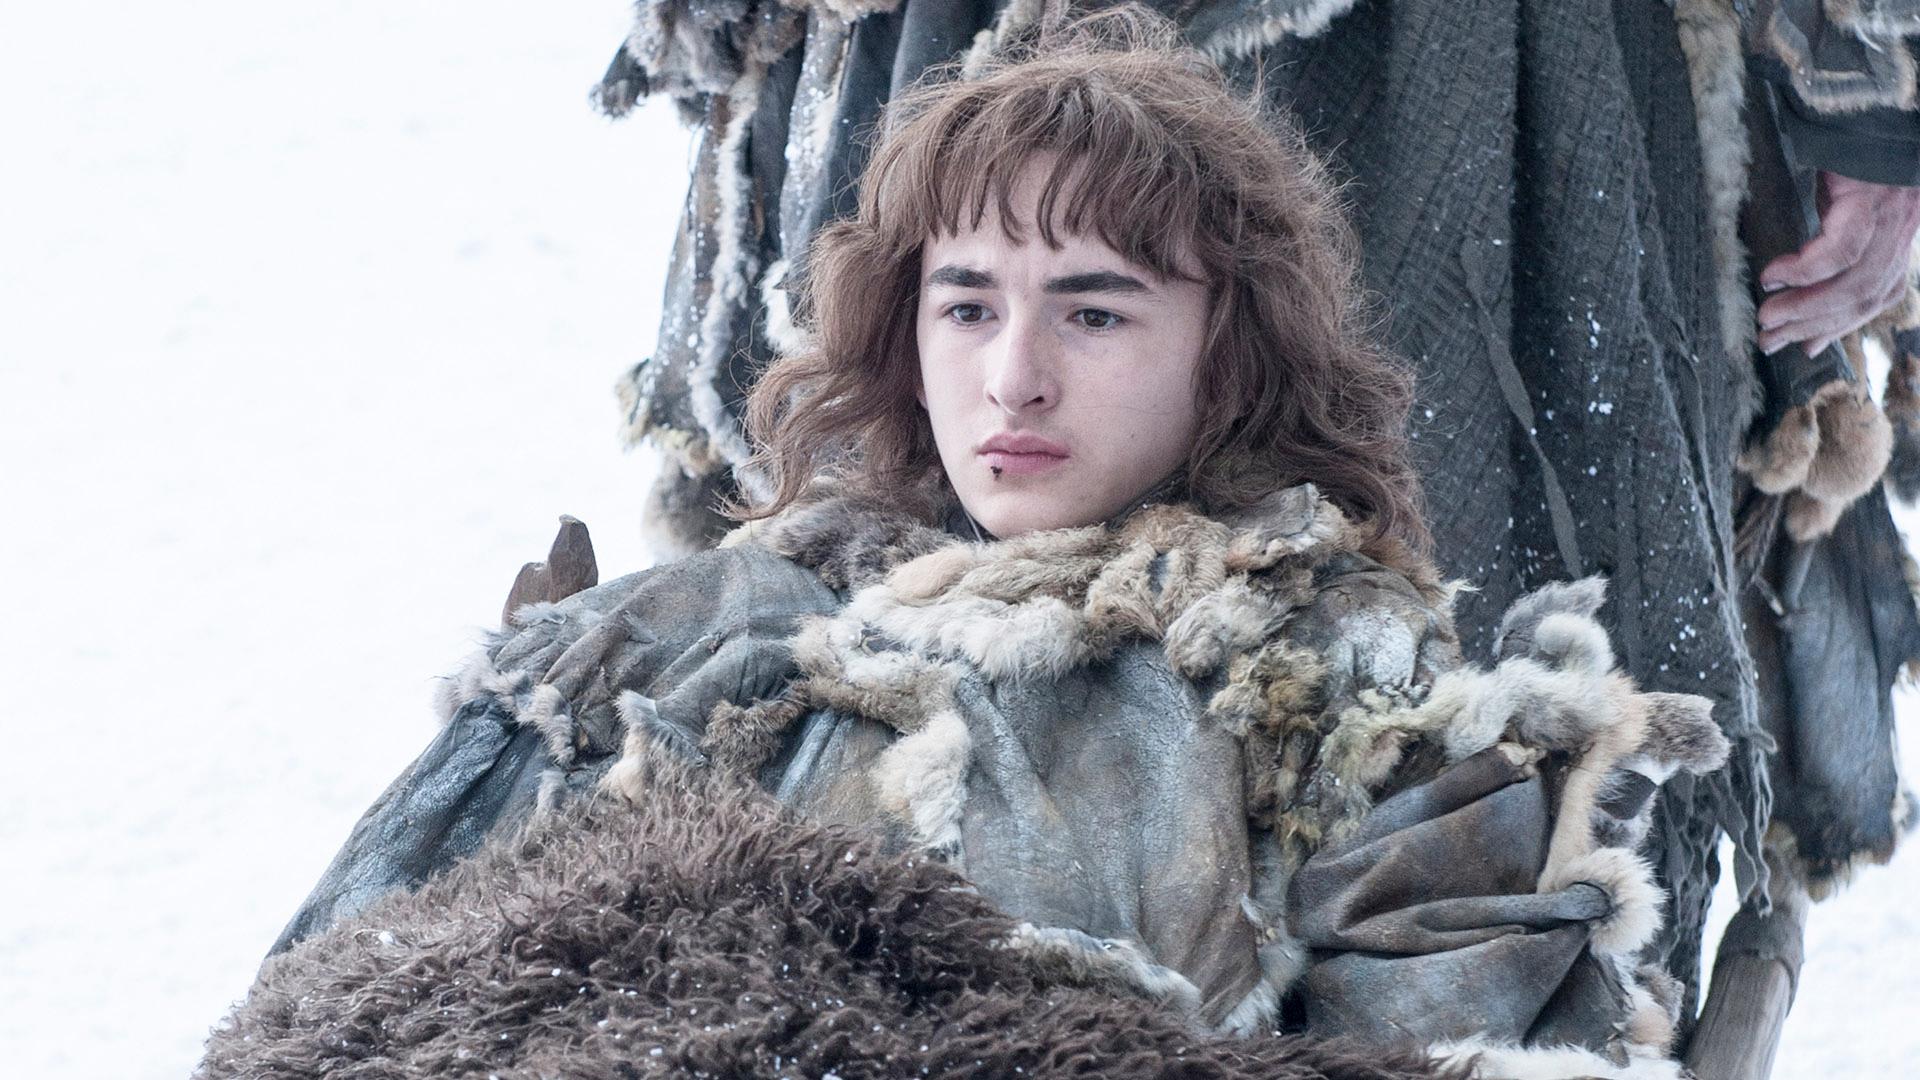 Issac Hempstead Wright as Bran Stark